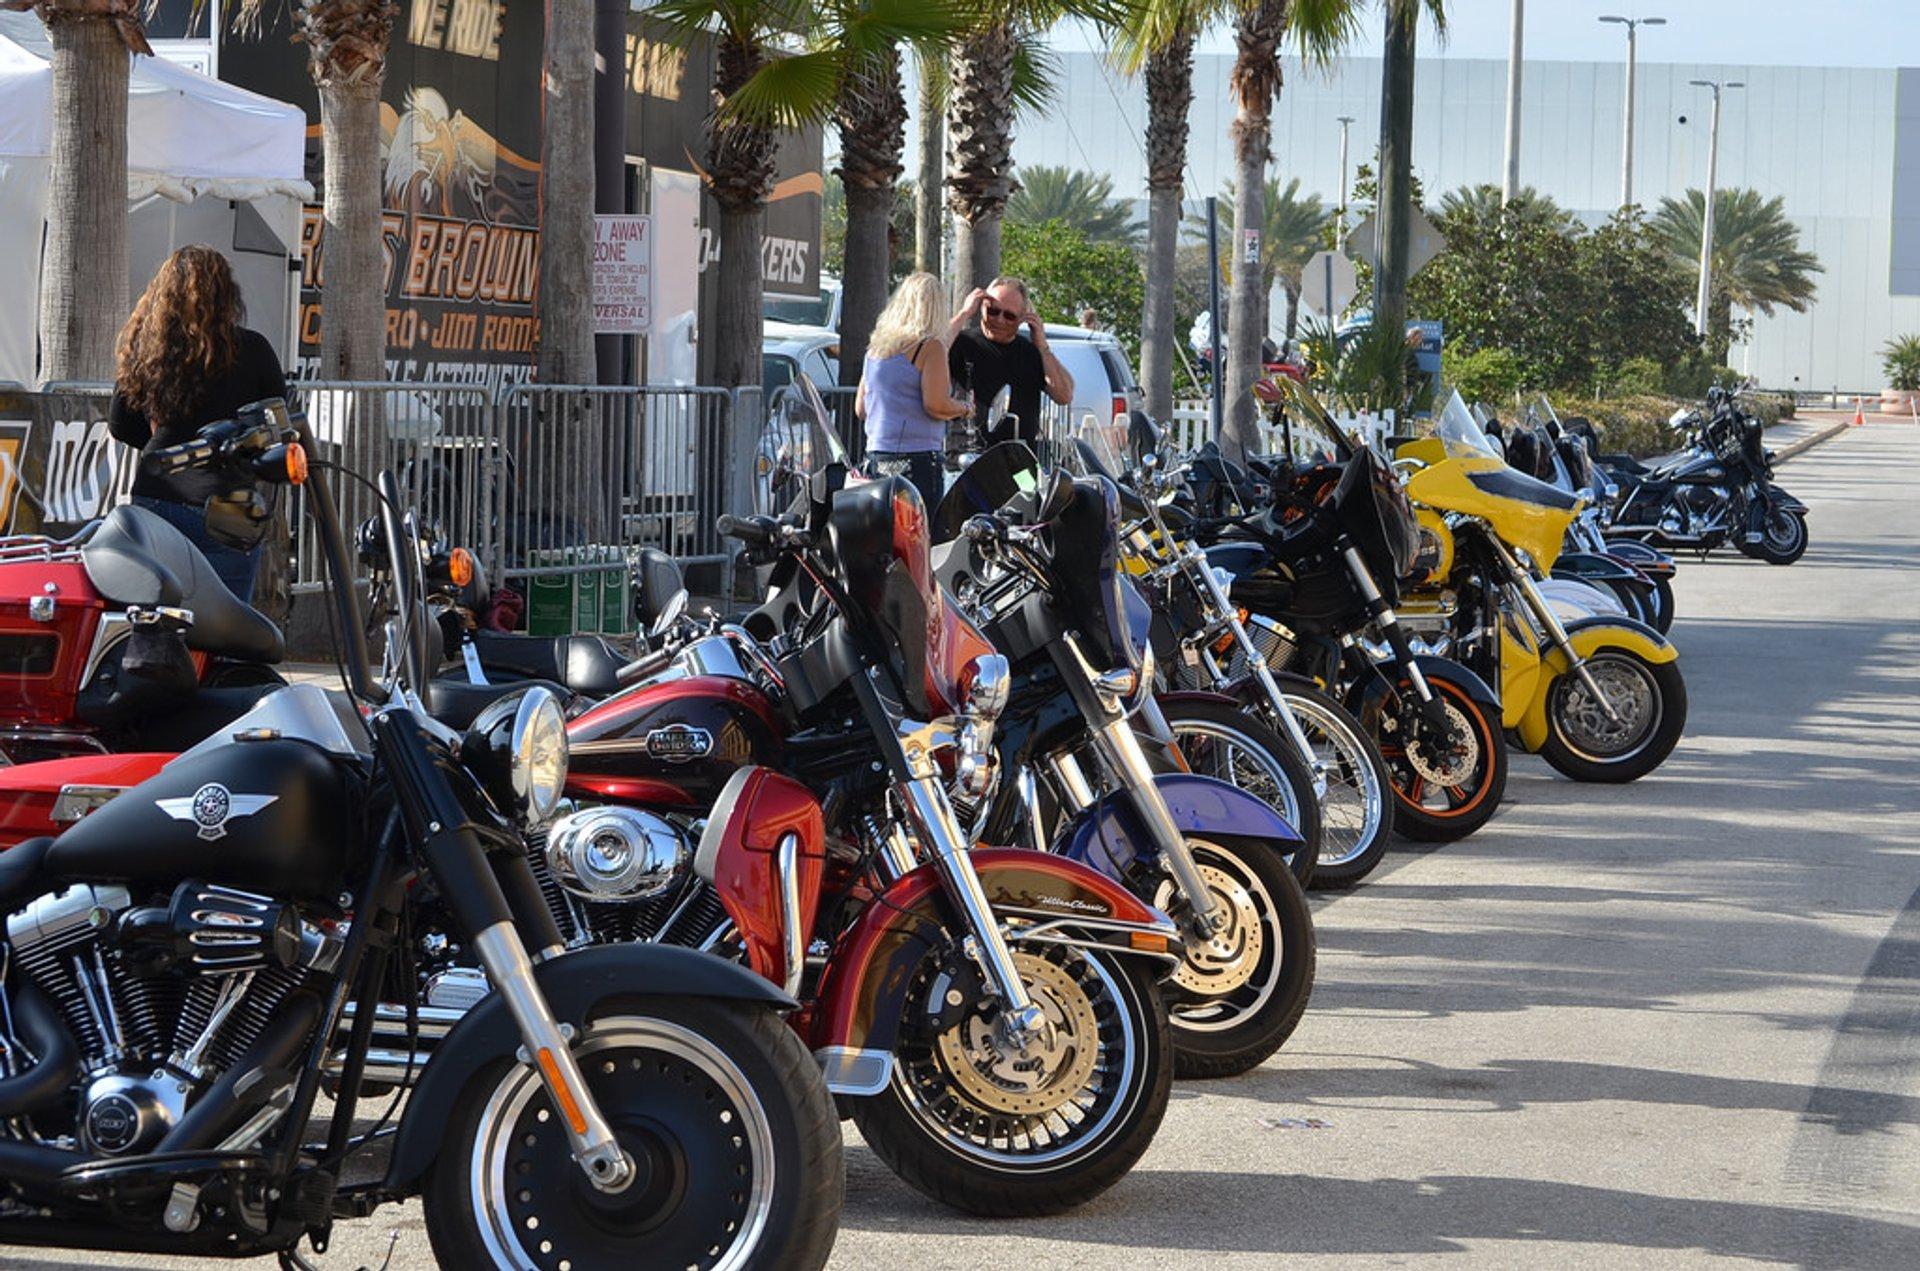 Daytona Beach Bike Week in Florida - Best Season 2020